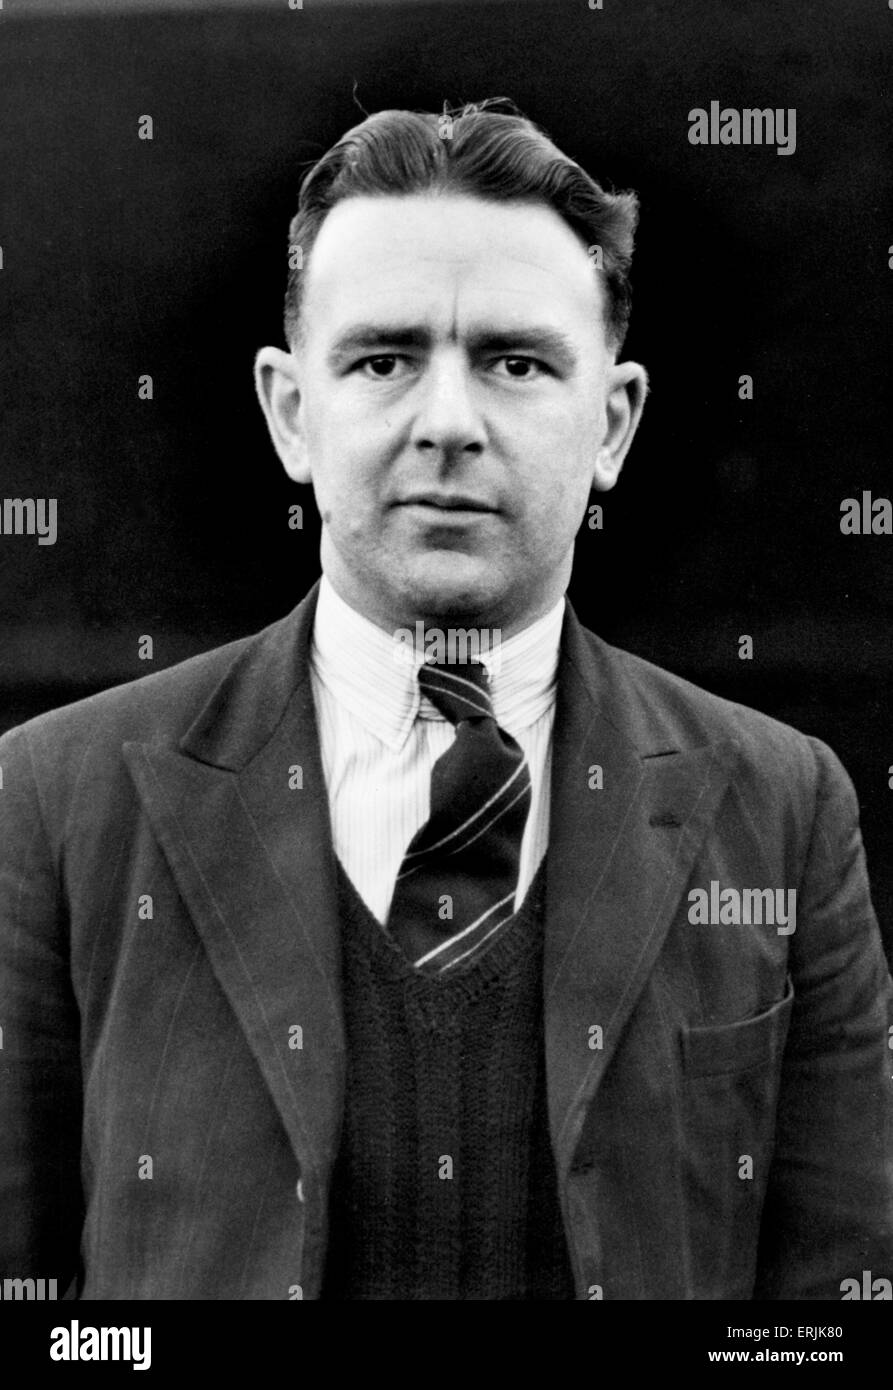 Warwickshire County Cricket Club secretary Leslie Deakins. Circa 1950. - Stock Image